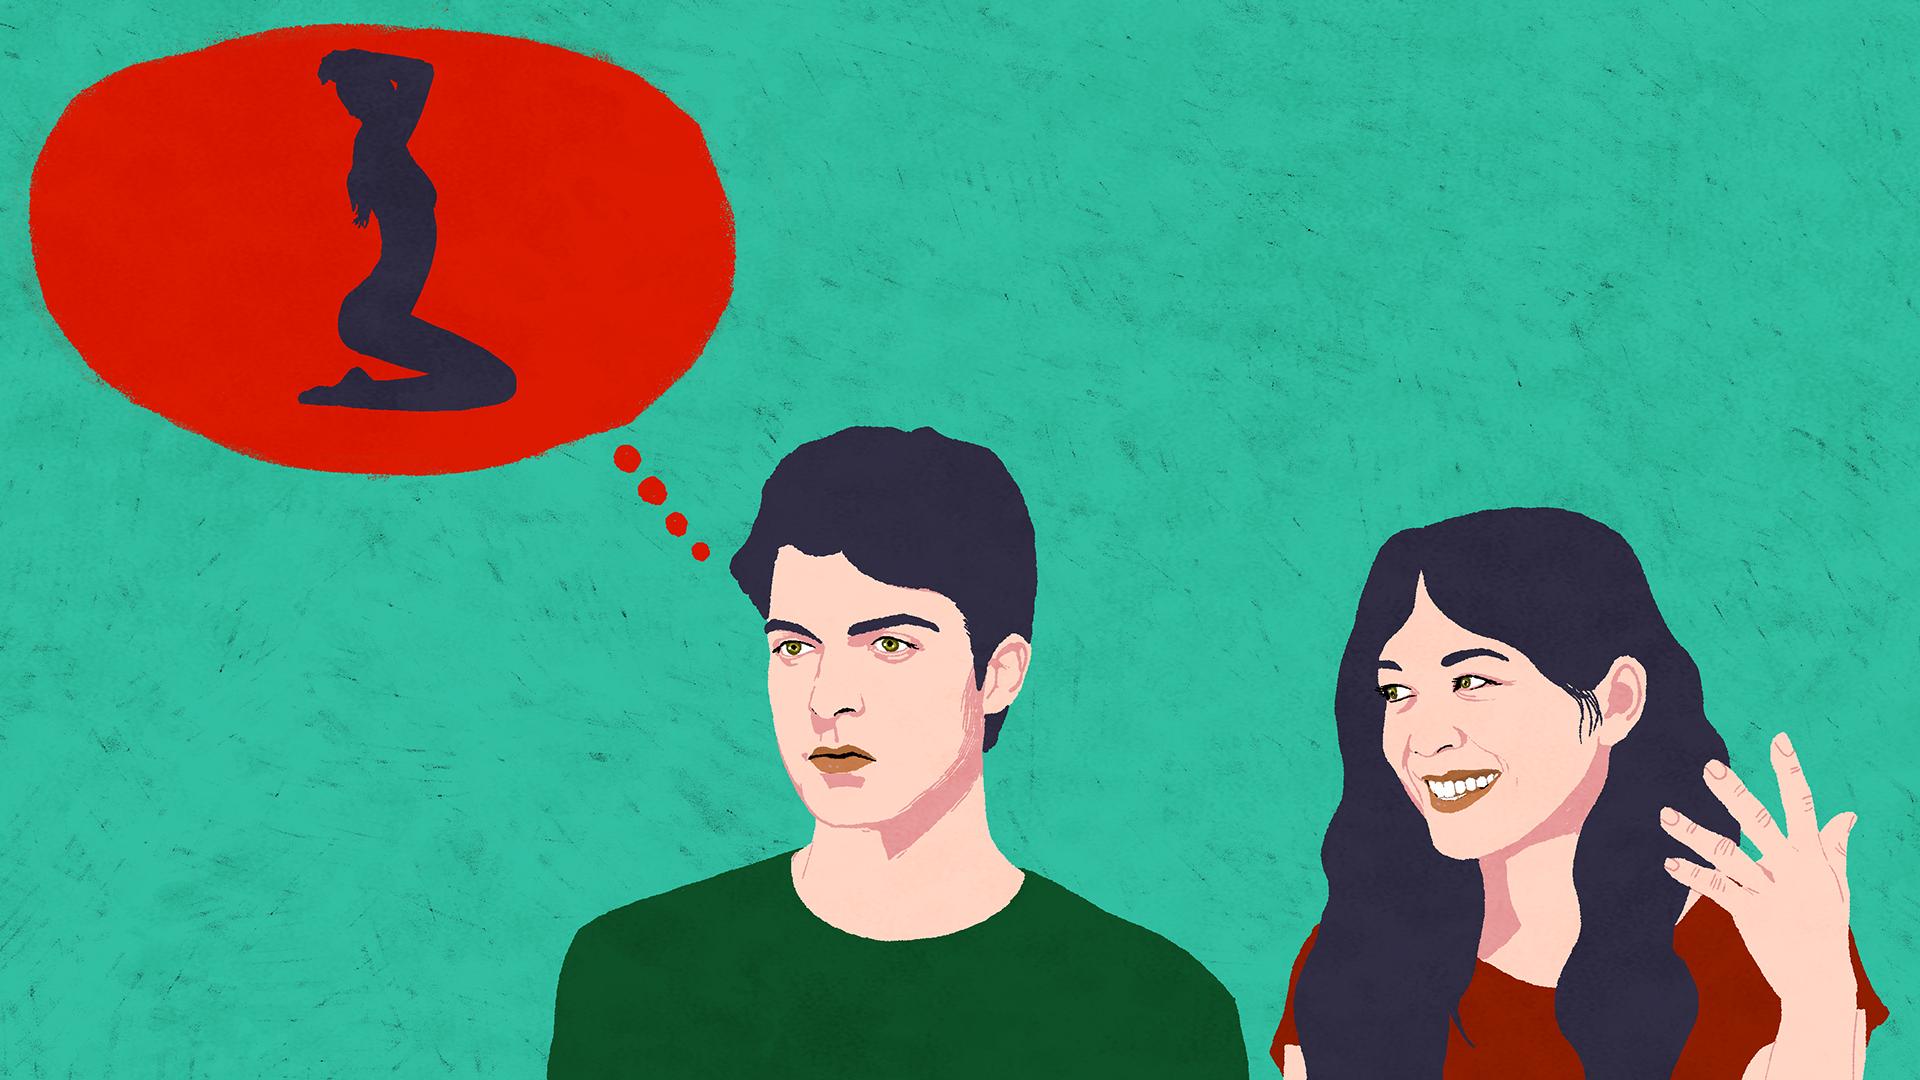 rebecca-hendin-bbc-three-no-fap-illustra